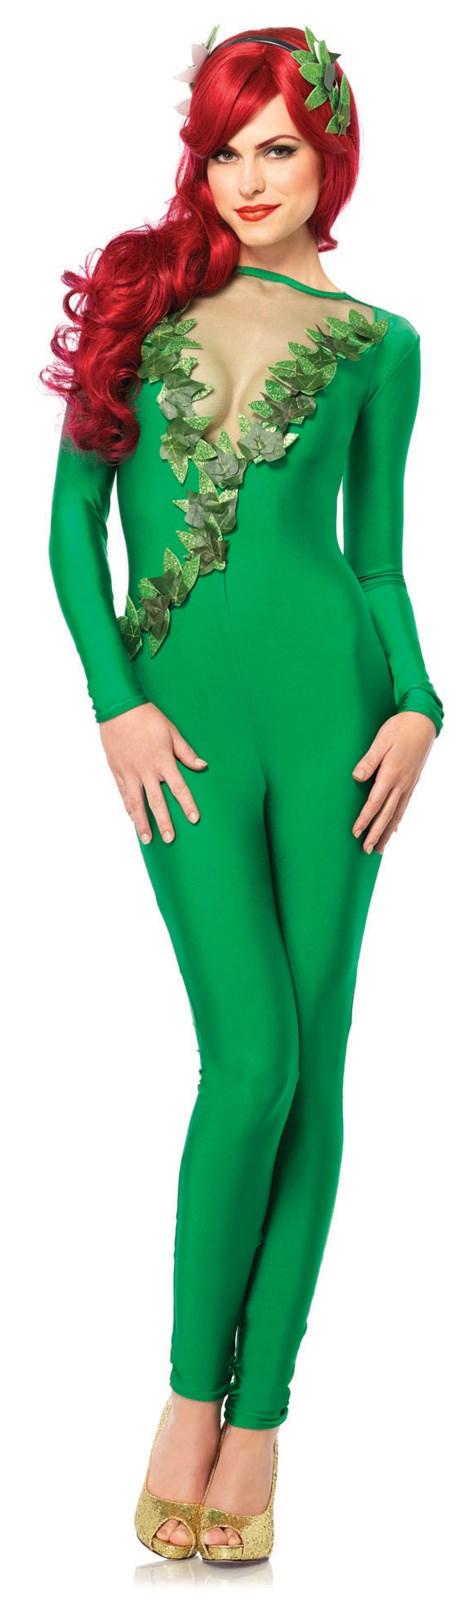 Poison Ivy Vixen Costume